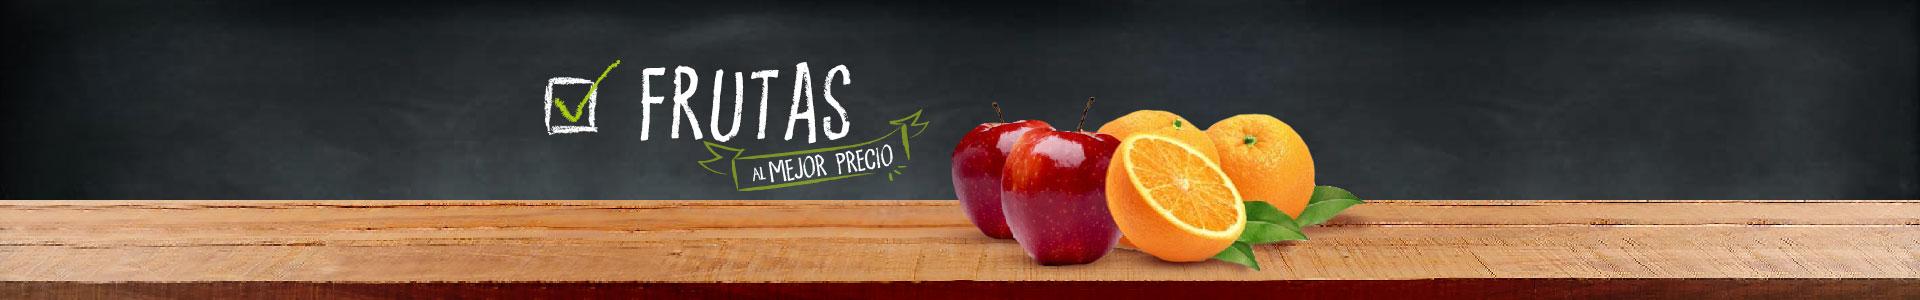 Frutas desktop